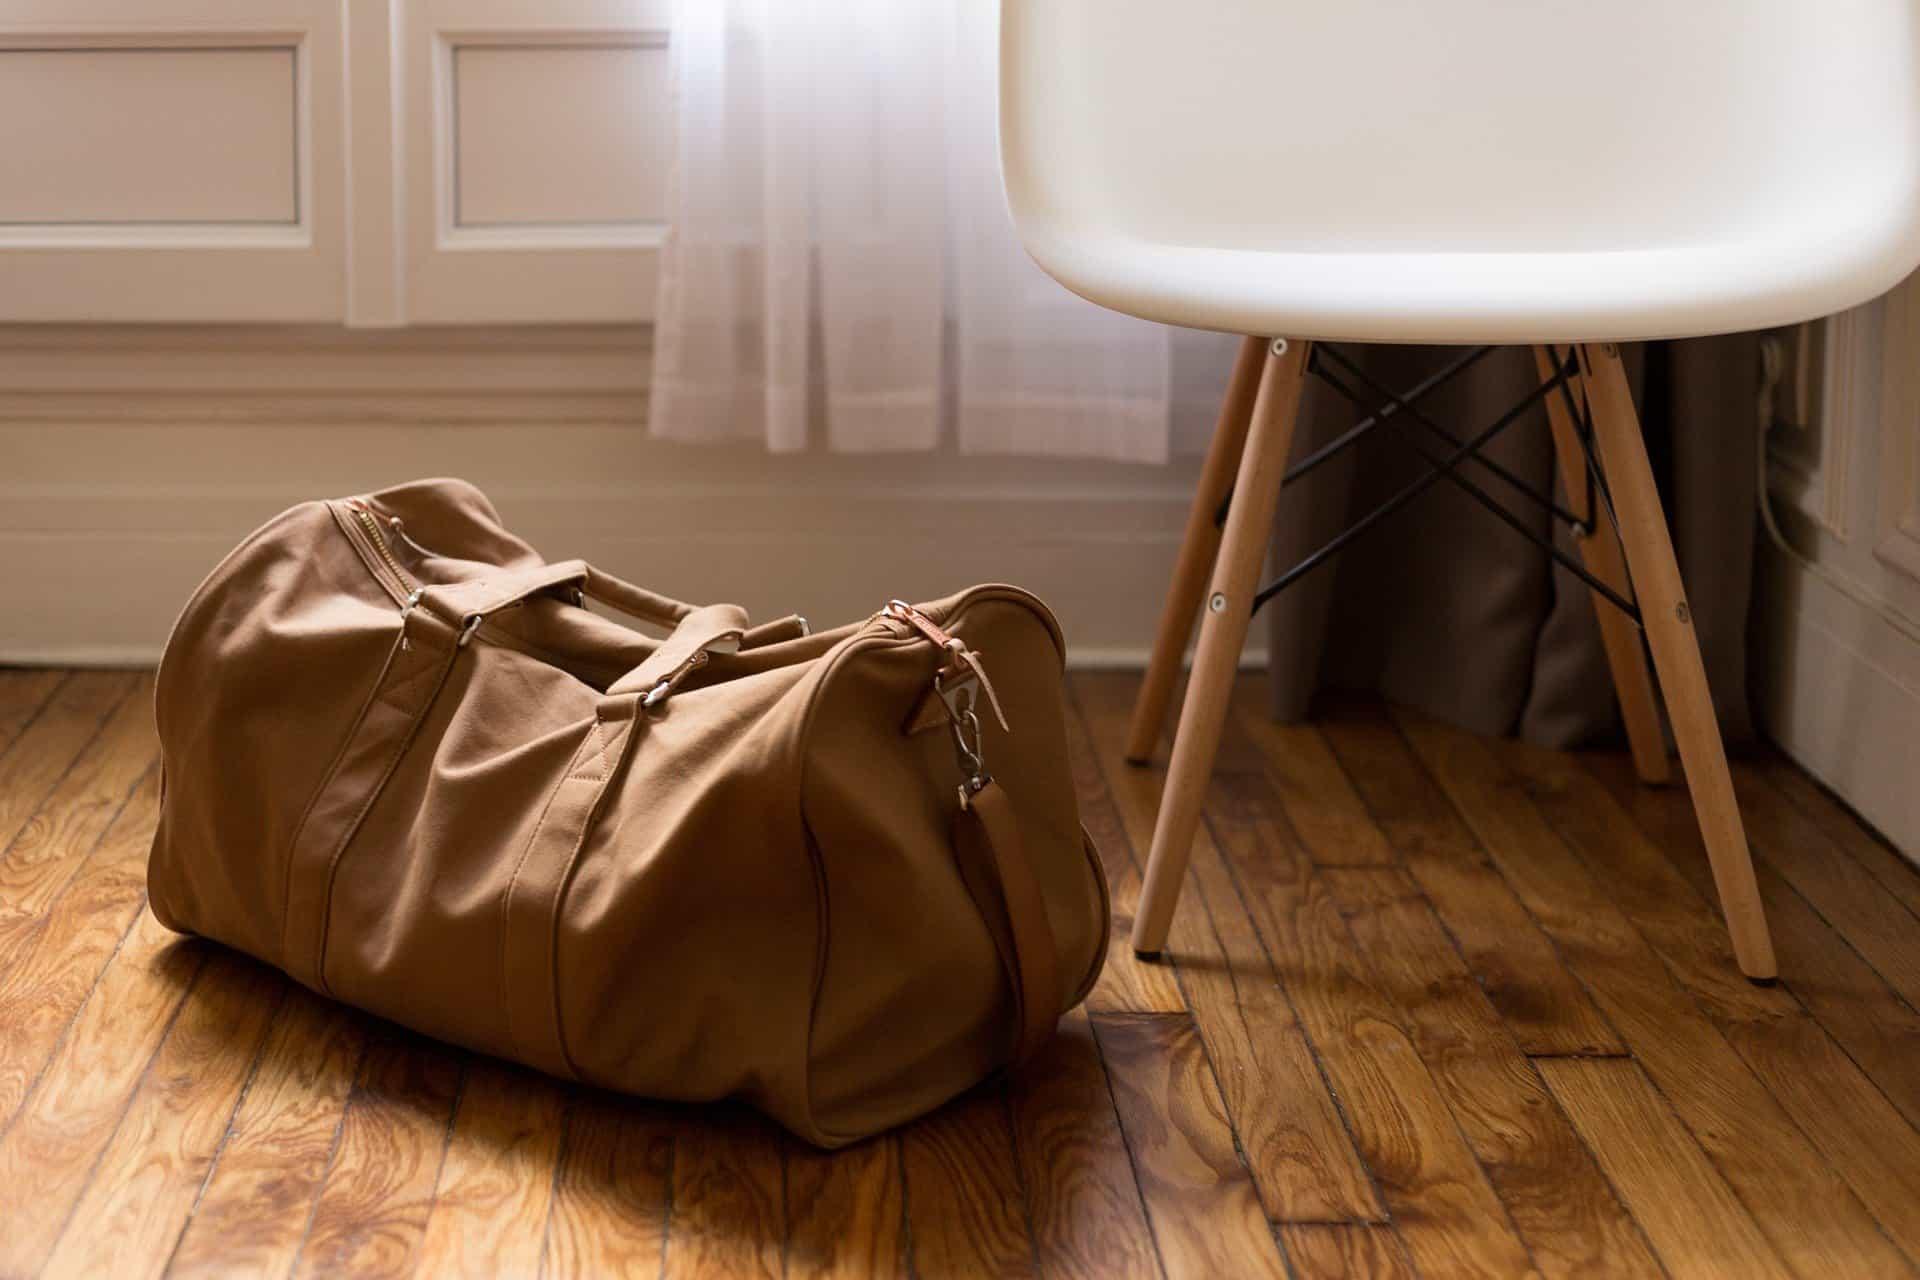 luggage duffle pixabay